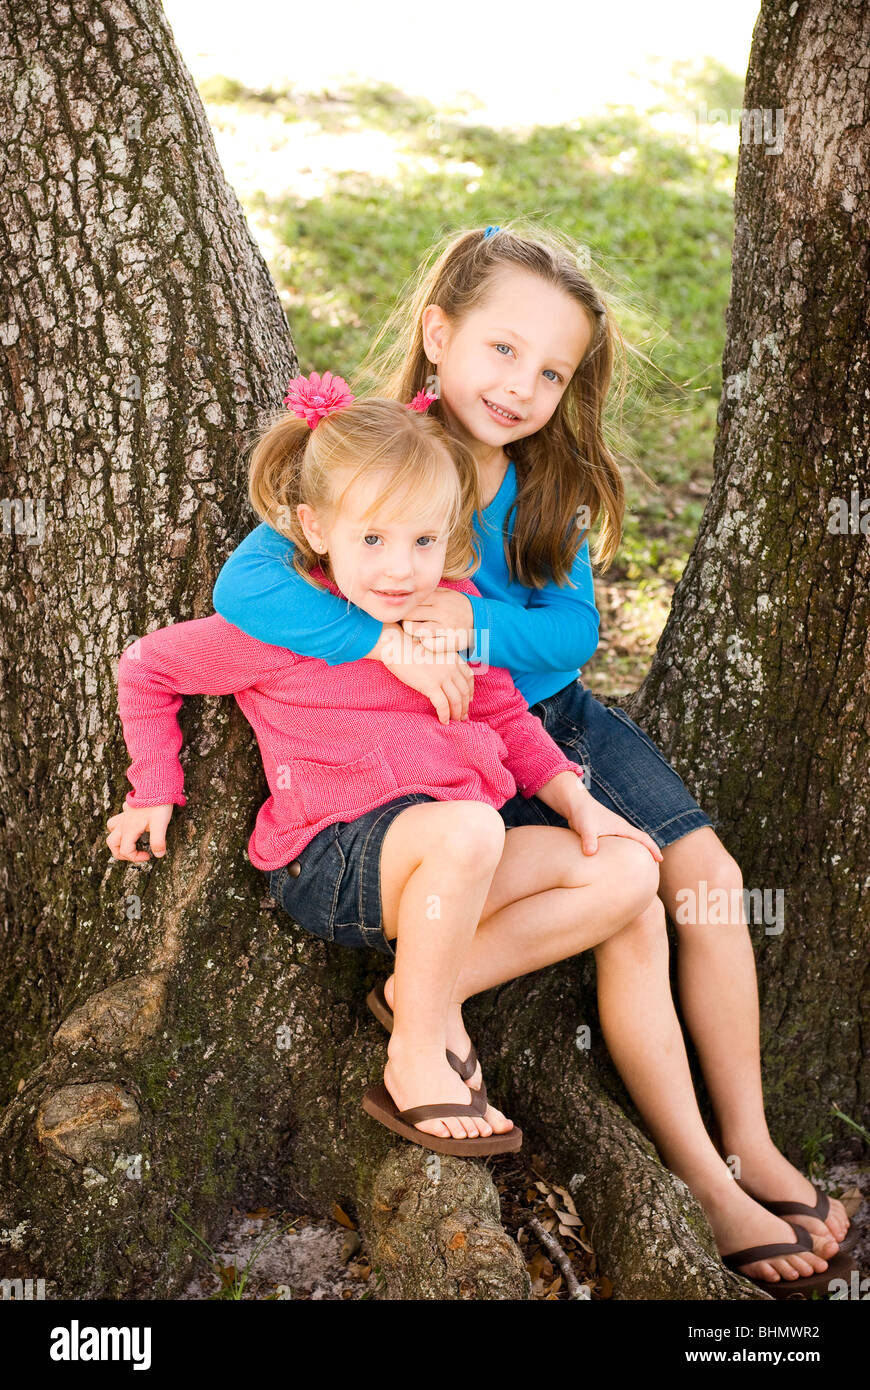 Sisters posing on tree - Stock Image